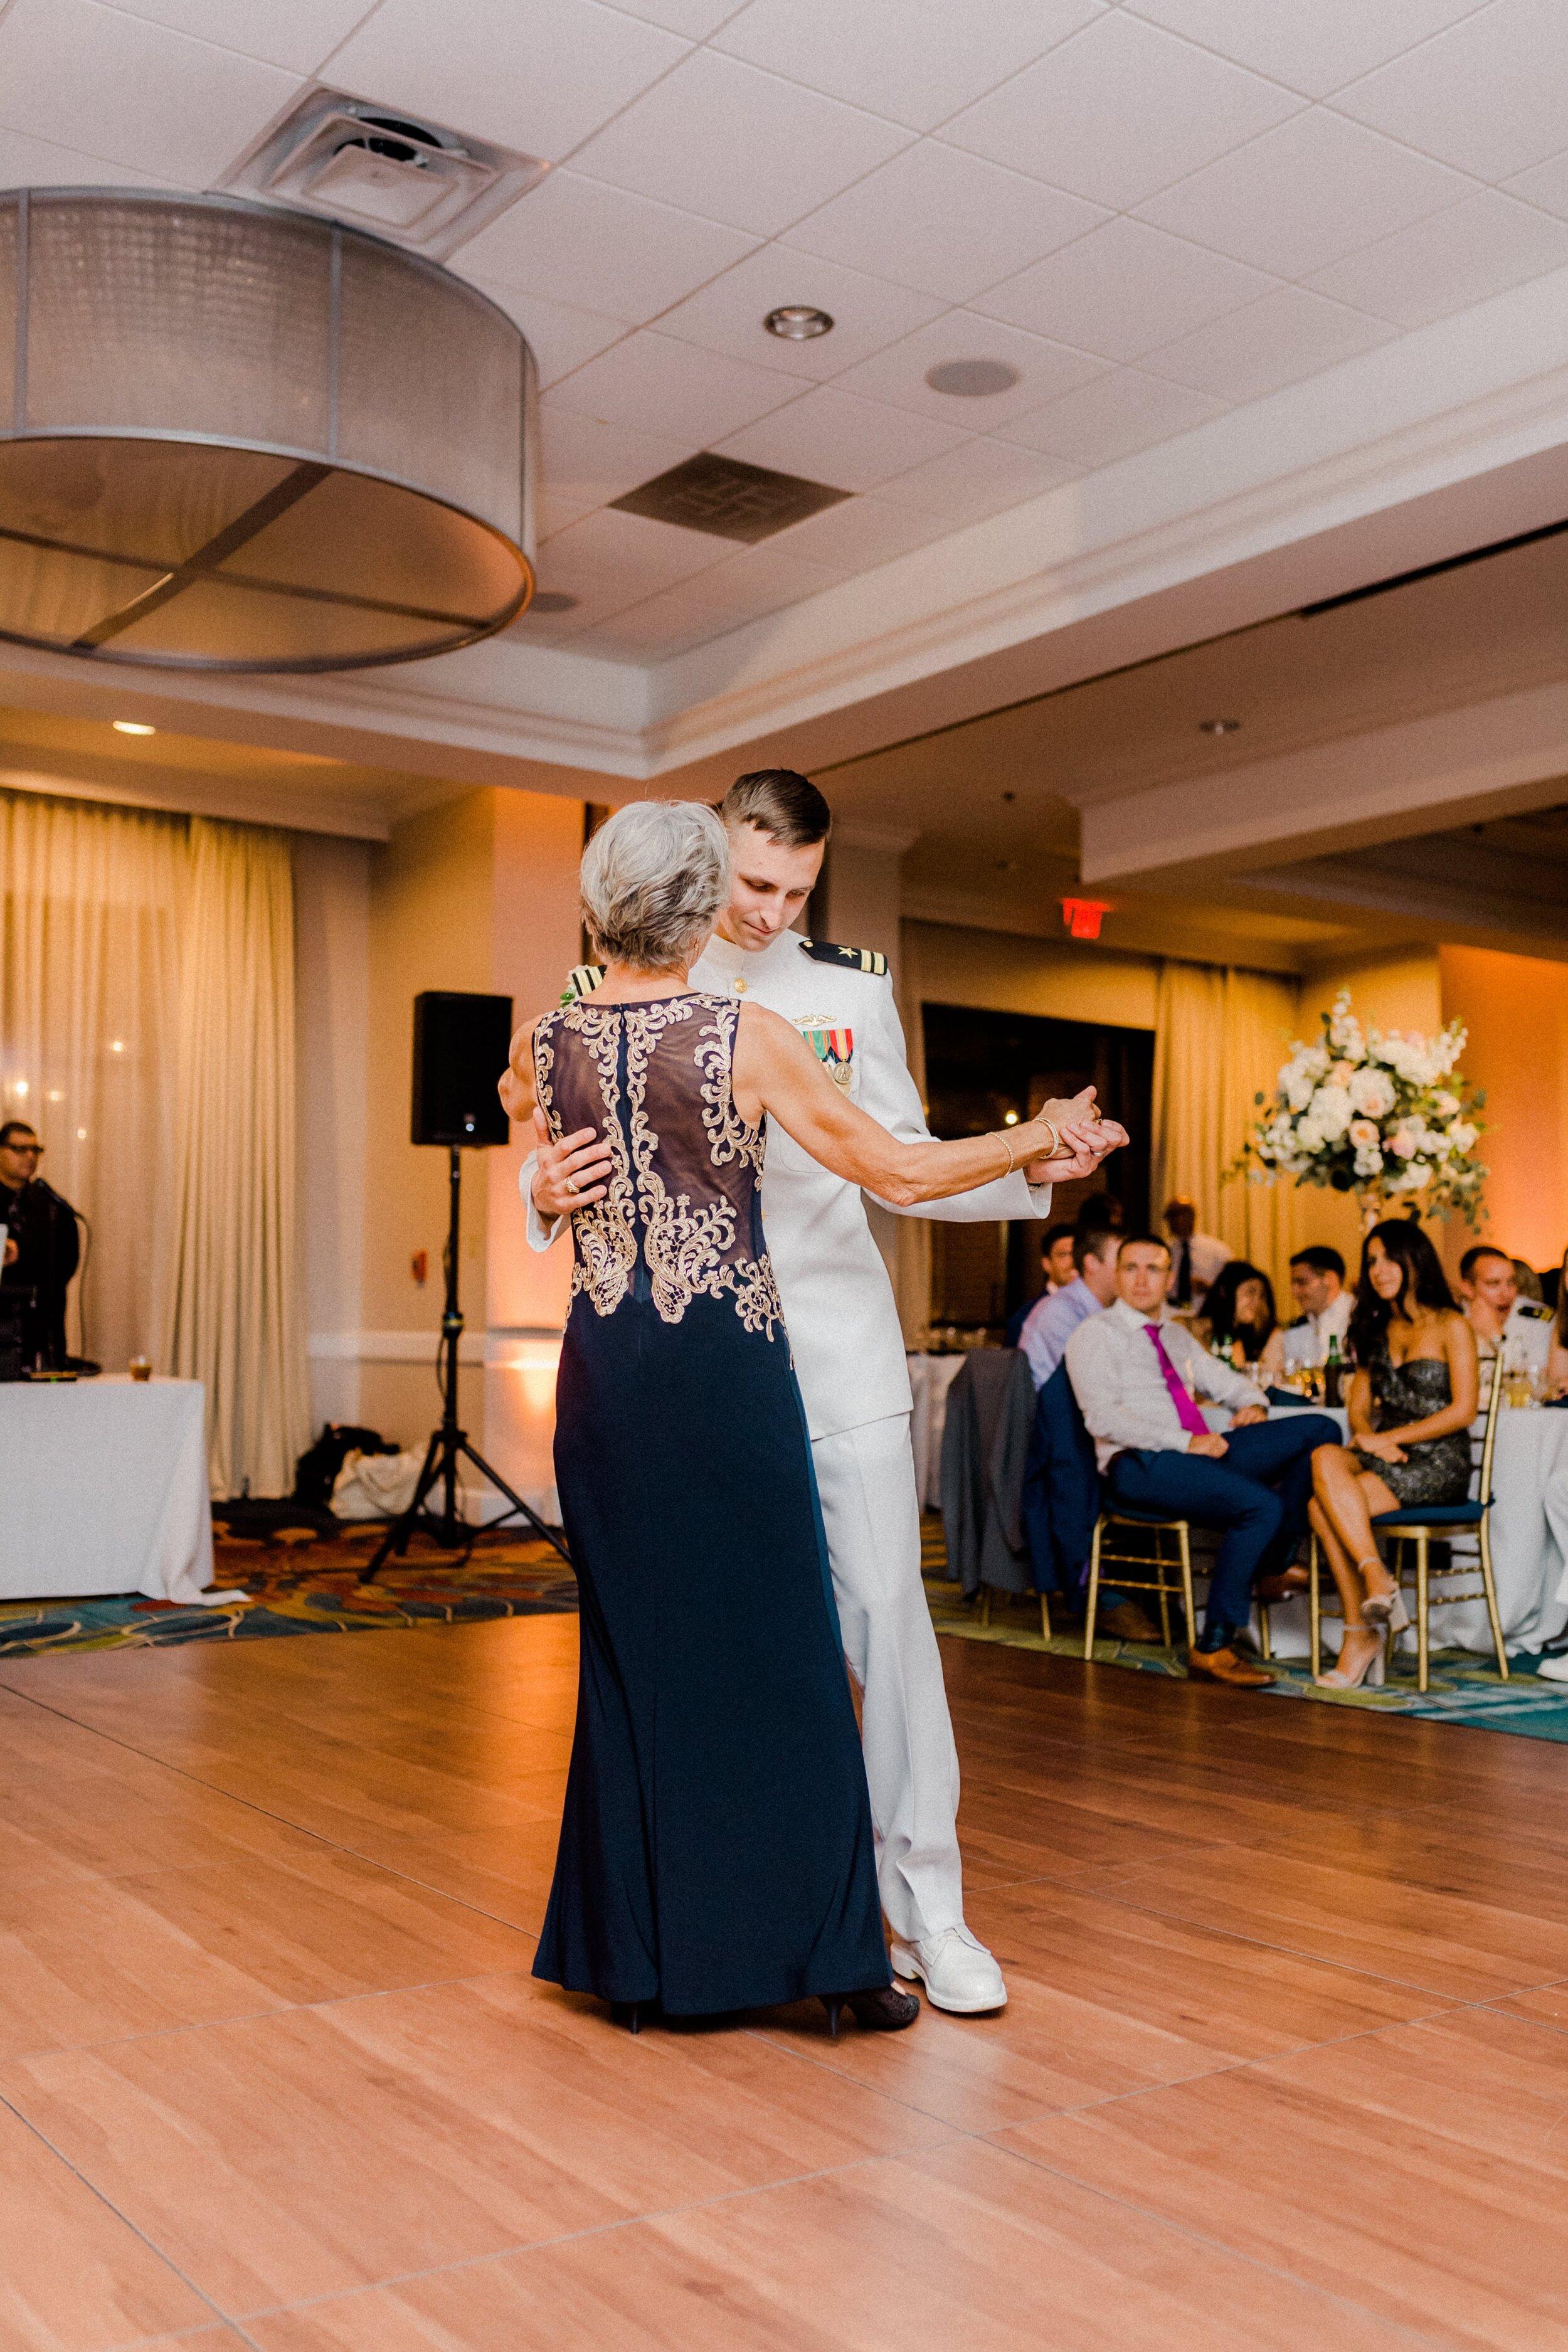 annapolis-wedding-photographer-hotel-annapolis-hannah-lane-photography-1601.jpg